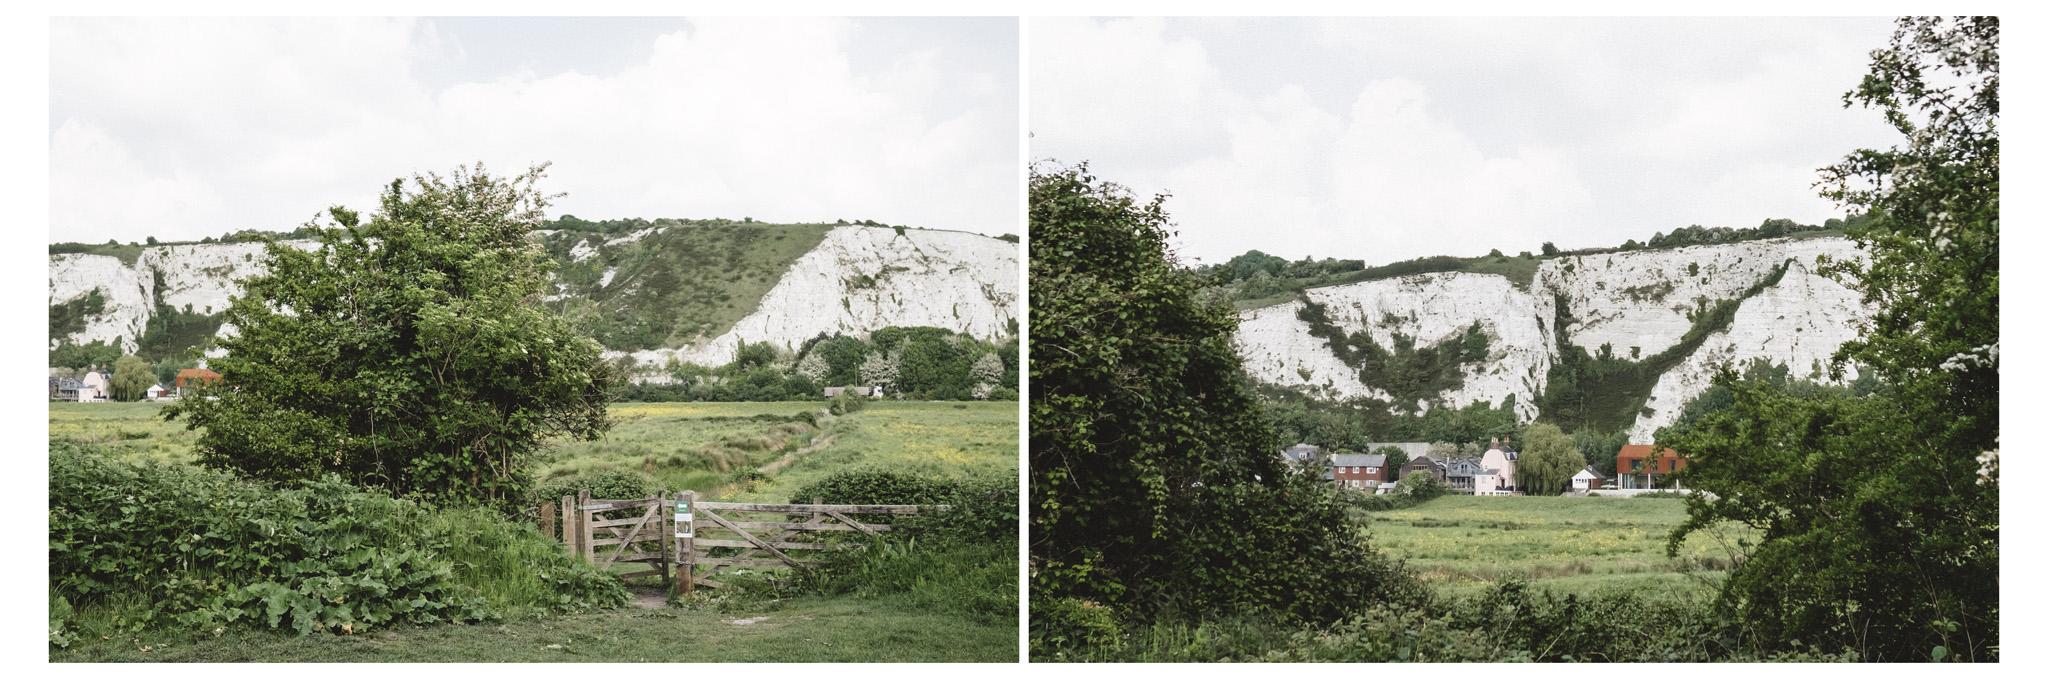 lewes_railway_land_web-9070.jpg